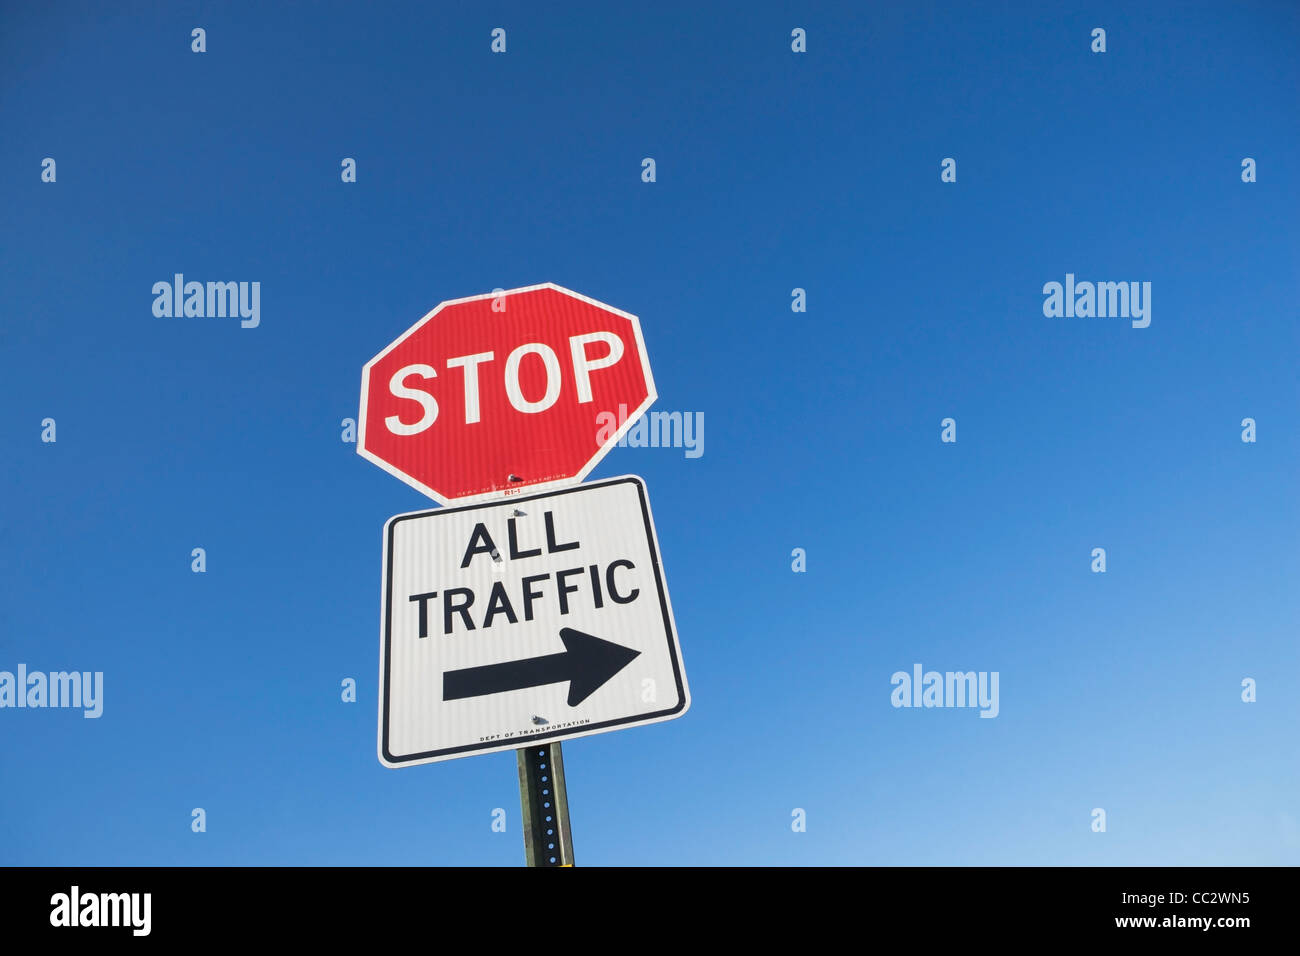 USA, New York City, Traffic diversion sign - Stock Image